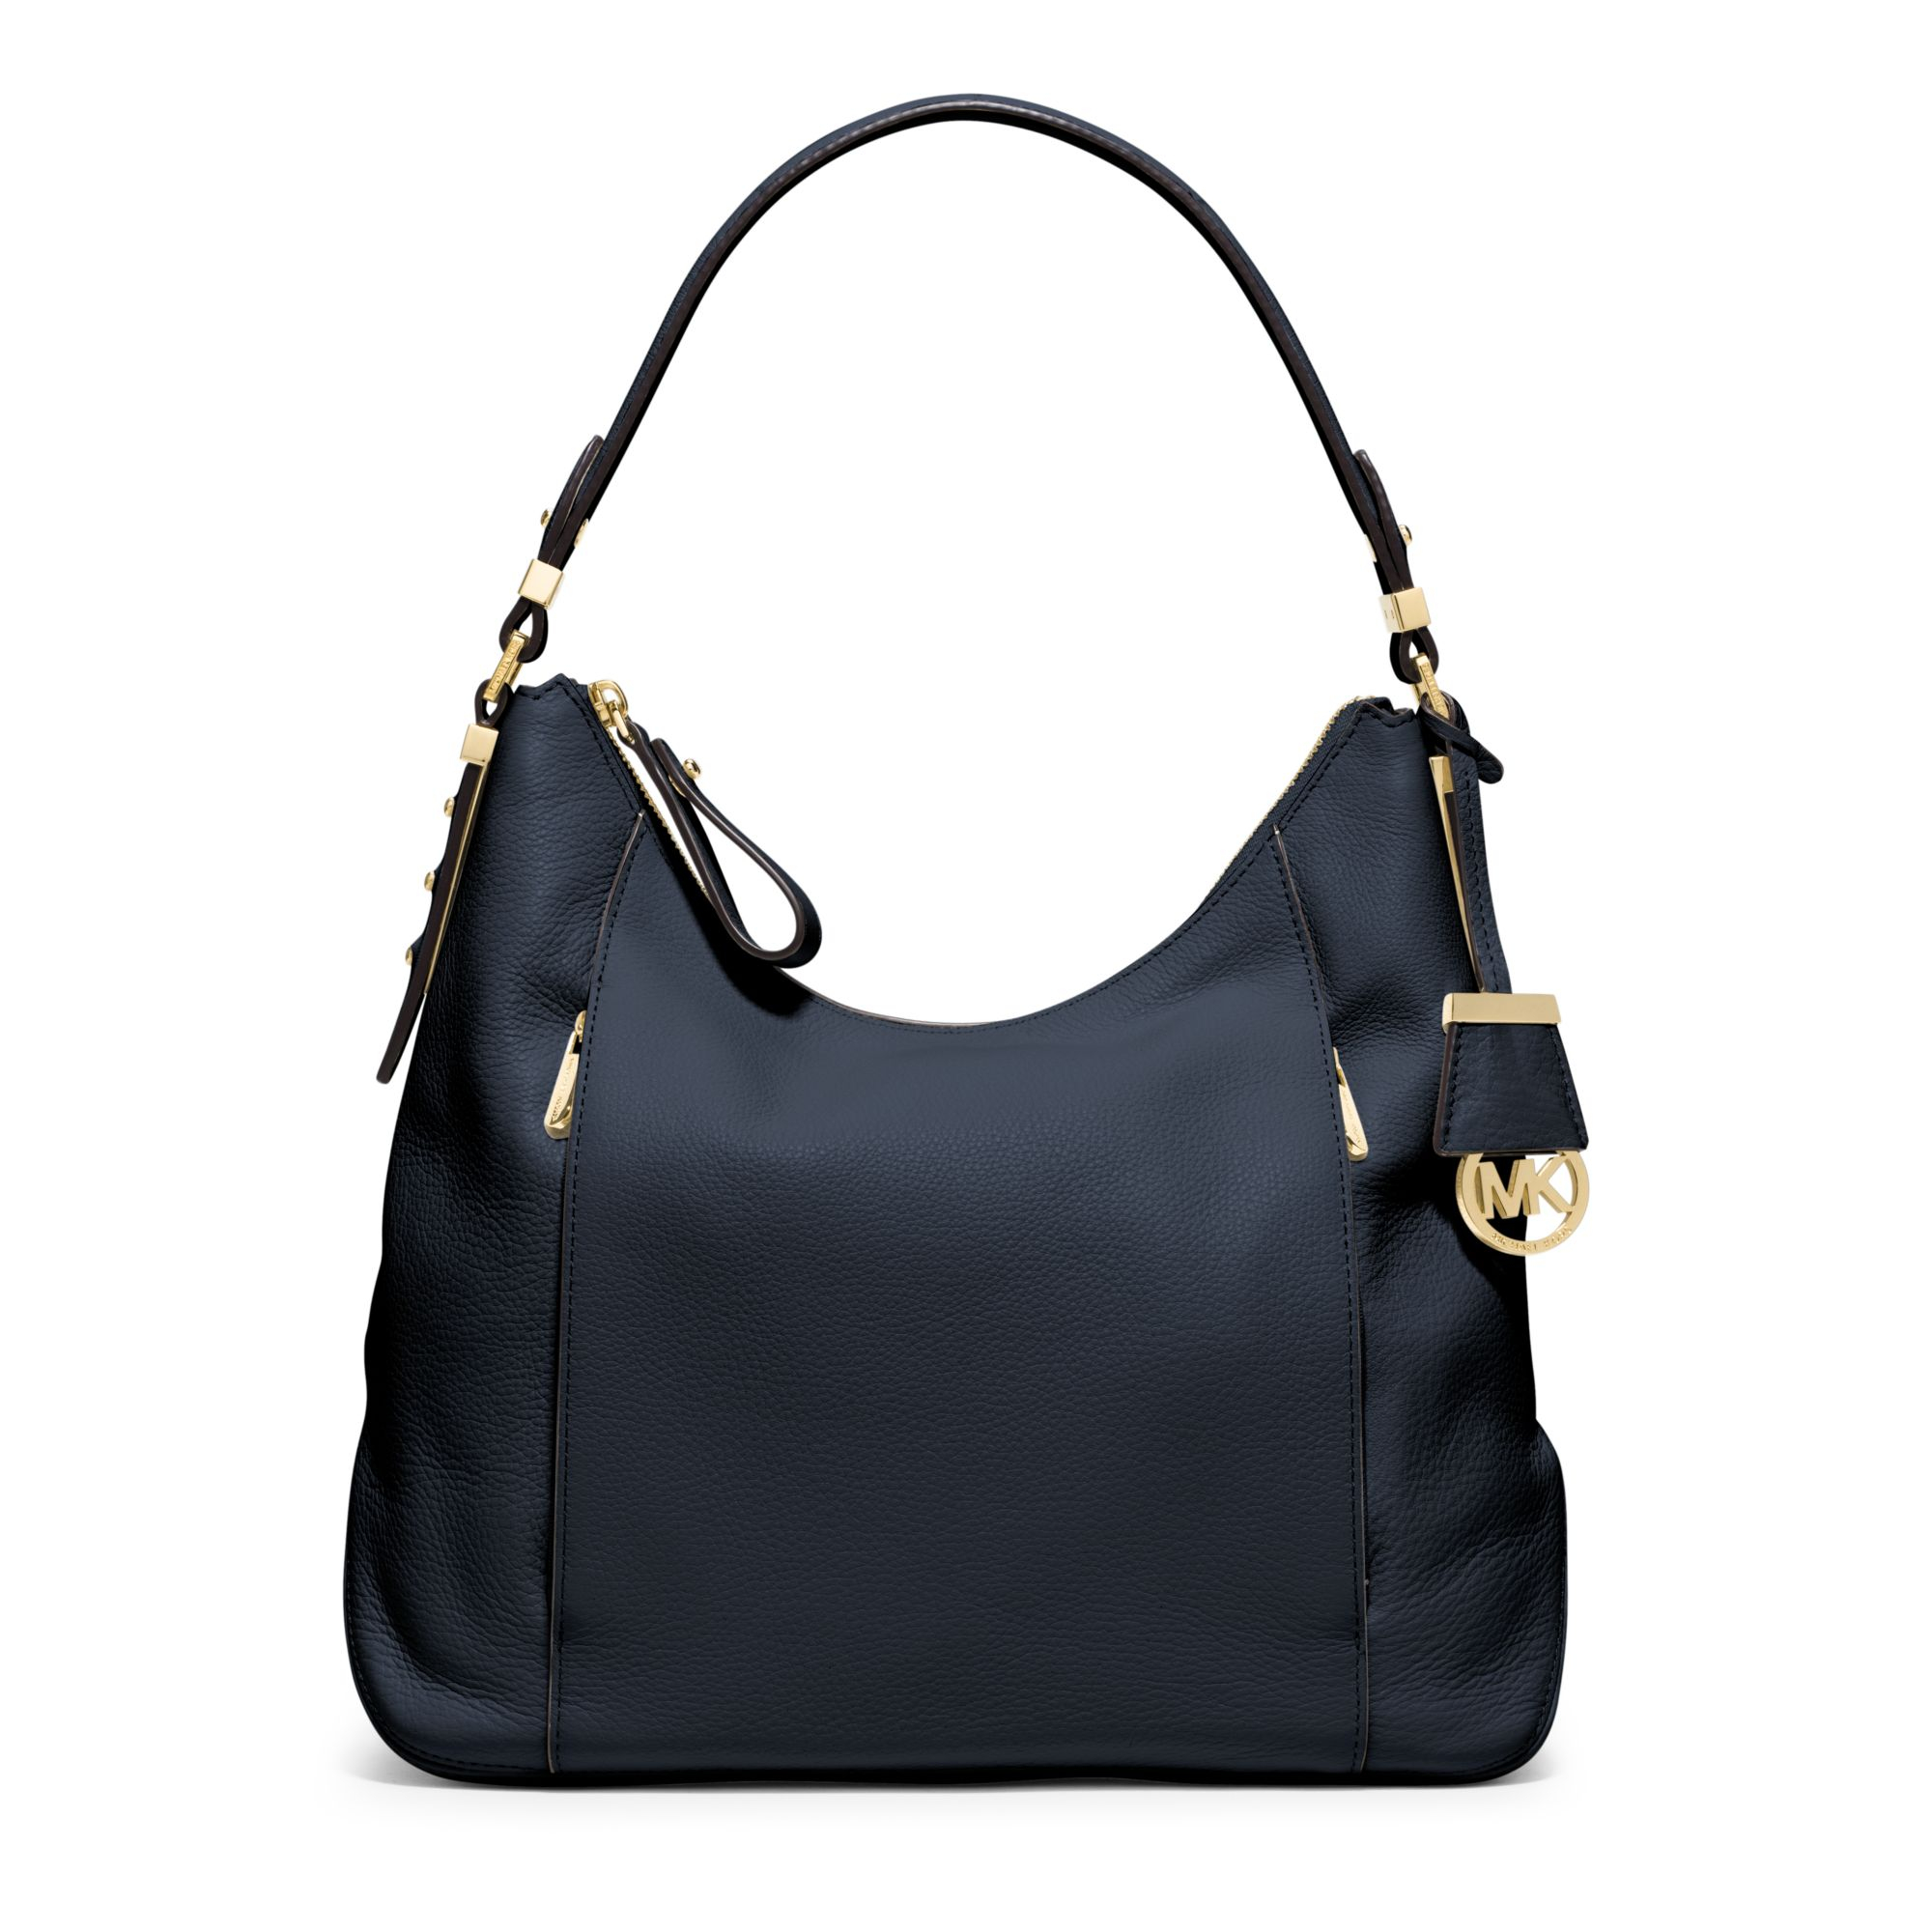 cef0bef24860 Lyst - Michael Kors Bowery Large Leather Shoulder Bag in Blue